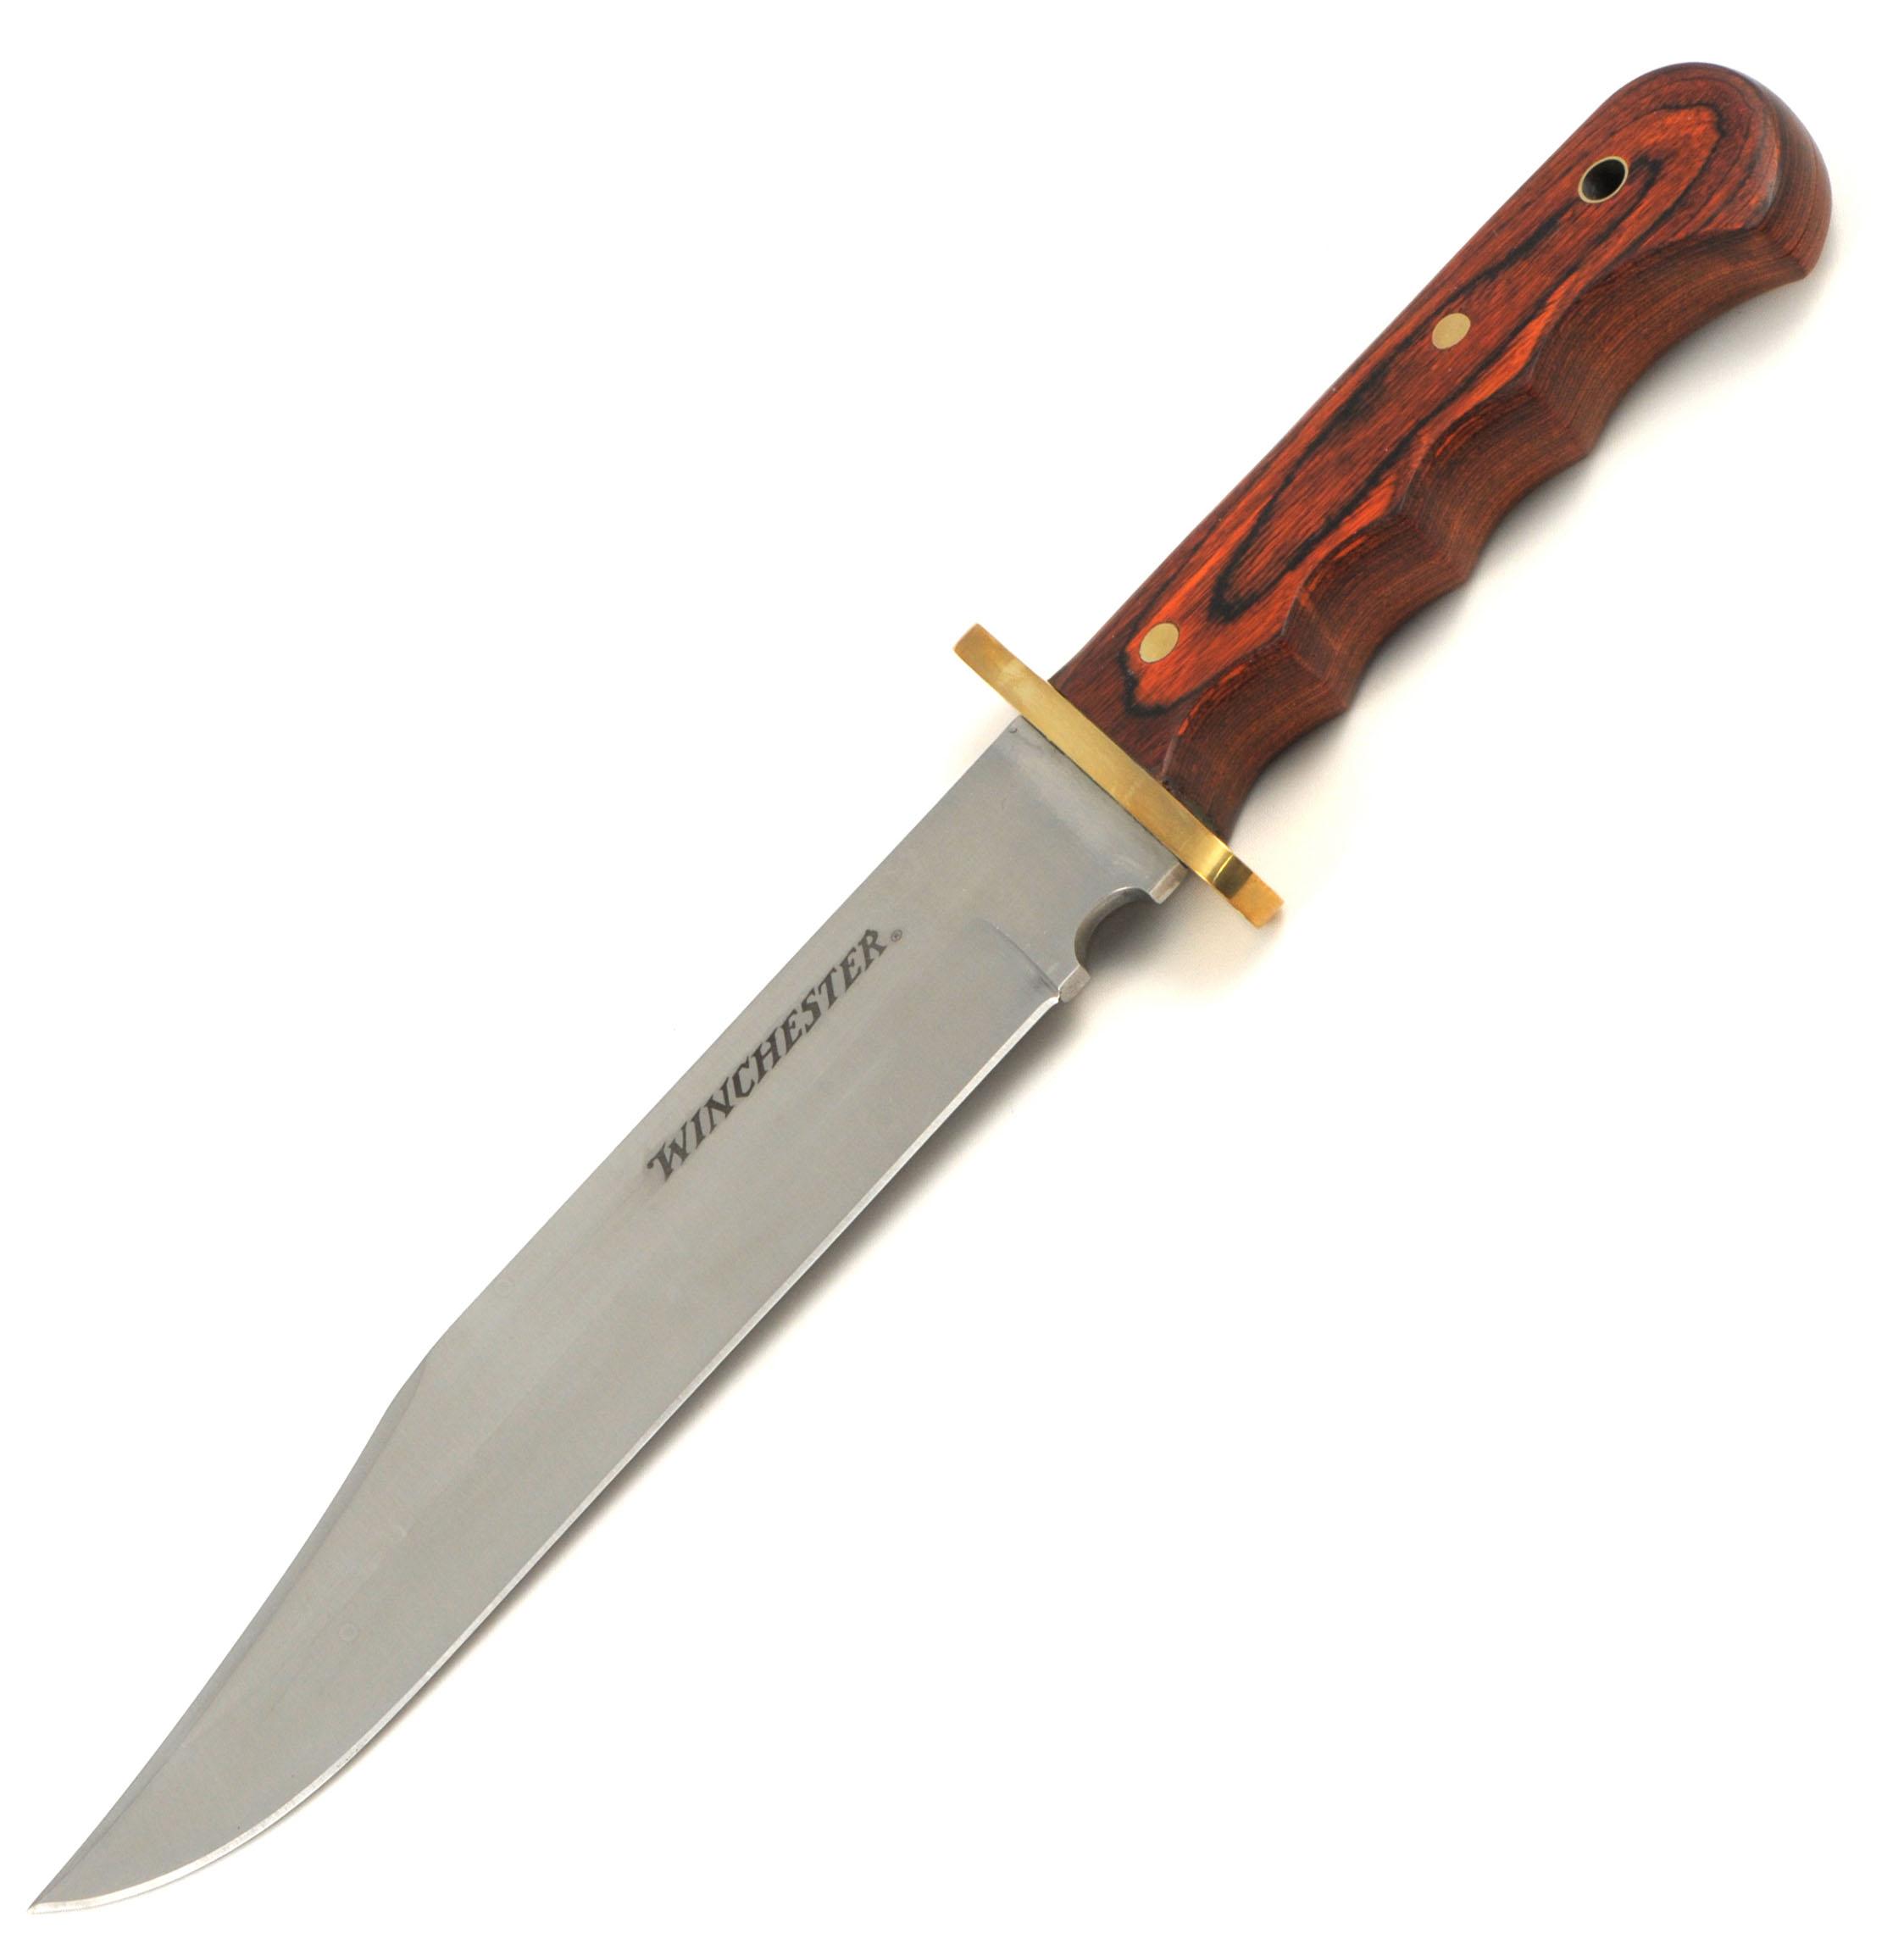 Avry's knife.jpg